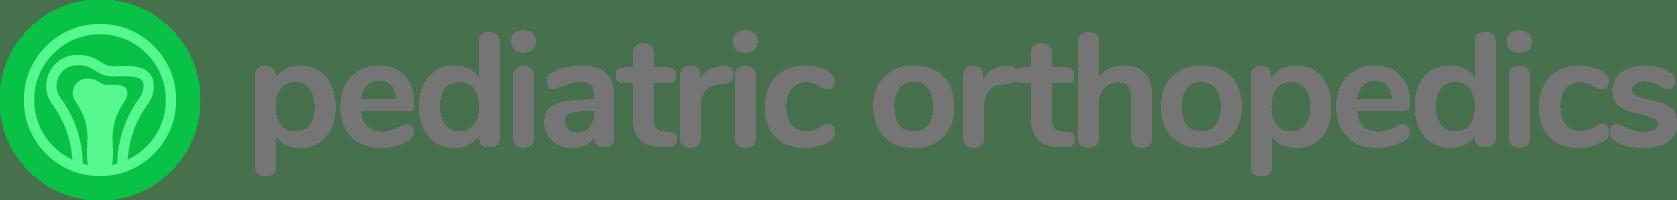 logo de categoria ortopedia pediatrica